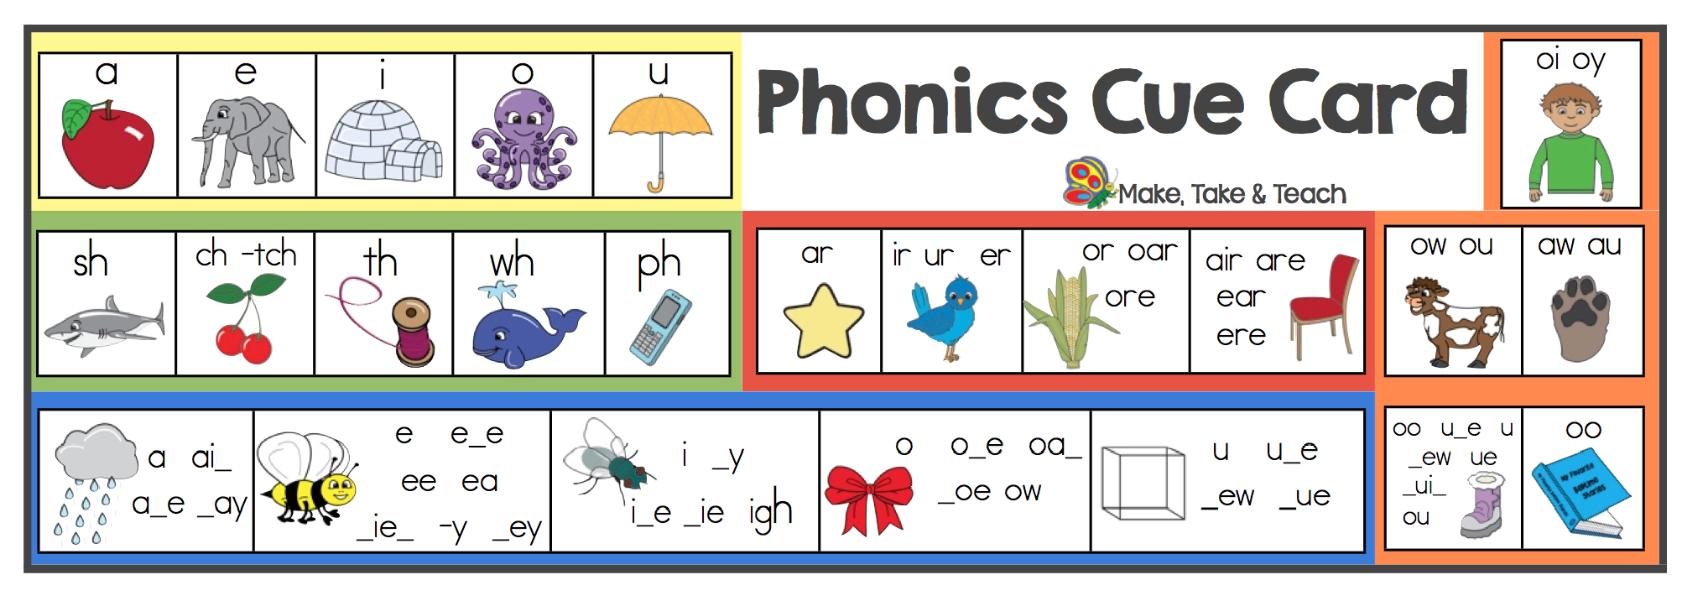 Free Phonics Cue Card - Make Take & Teach - Free Printable Blending Cards